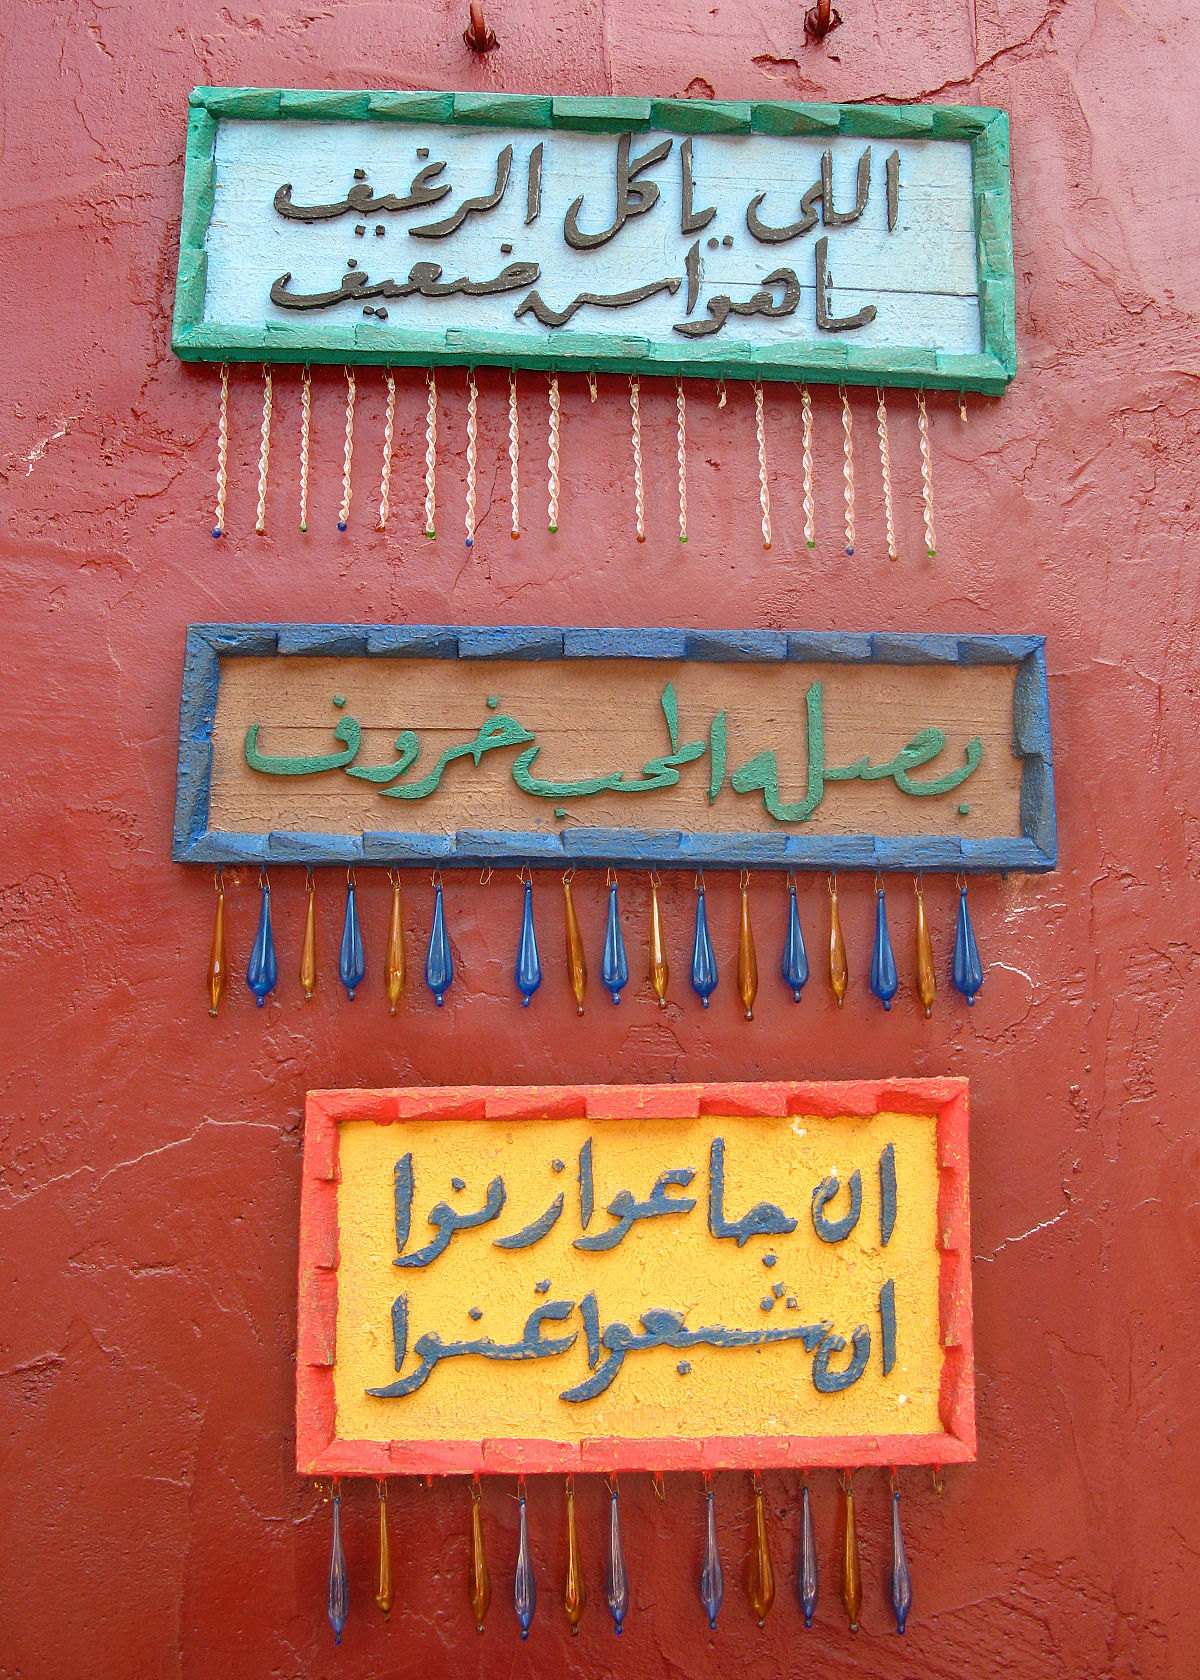 c3ad574438fd8 قائمة أمثال مصرية - ويكيبيديا، الموسوعة الحرة